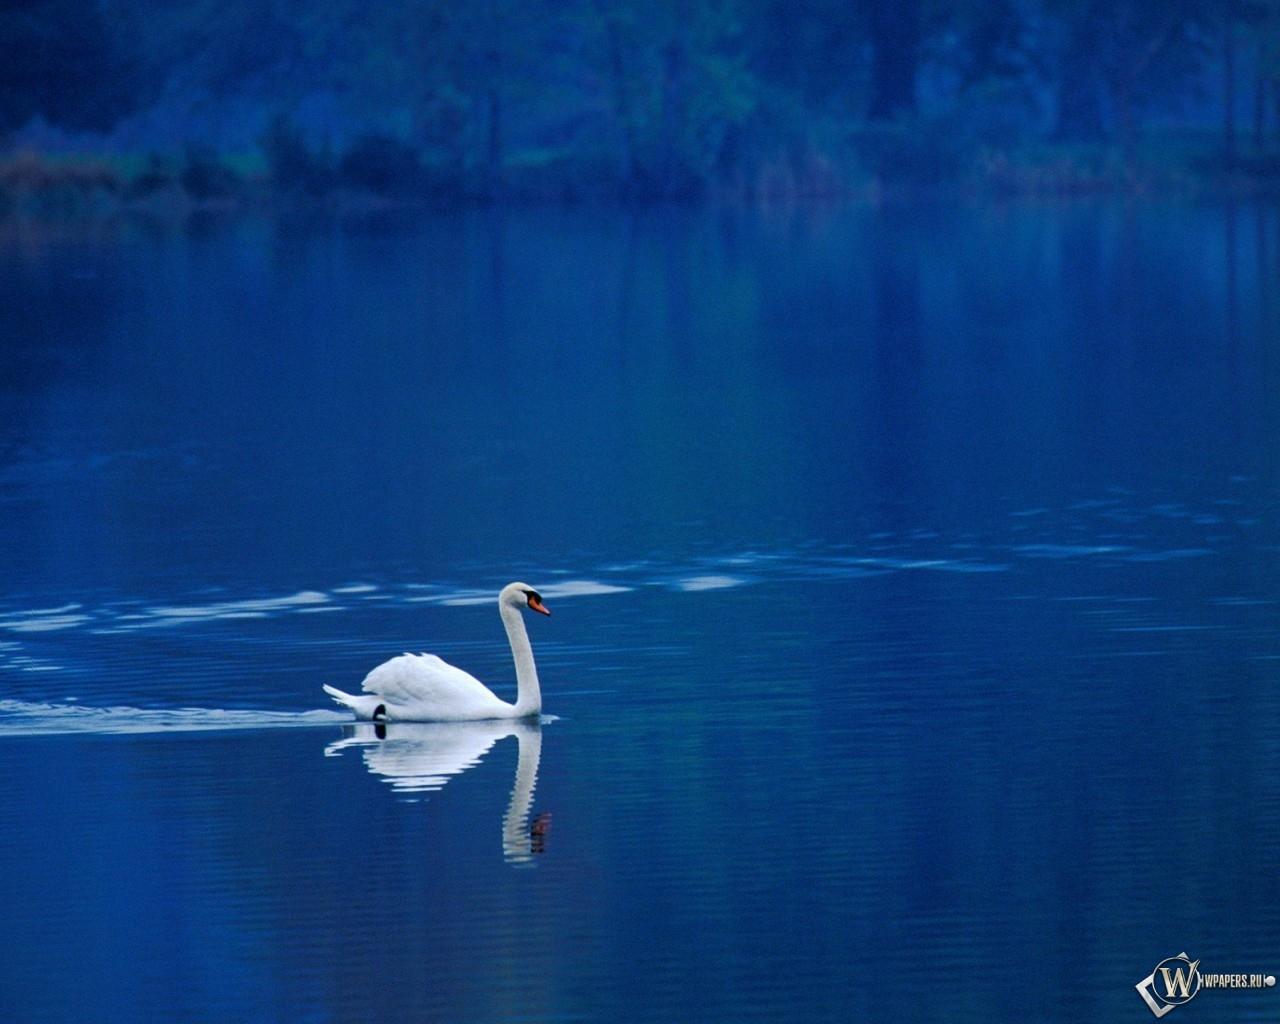 Одинокий лебедь на воде 1280x1024